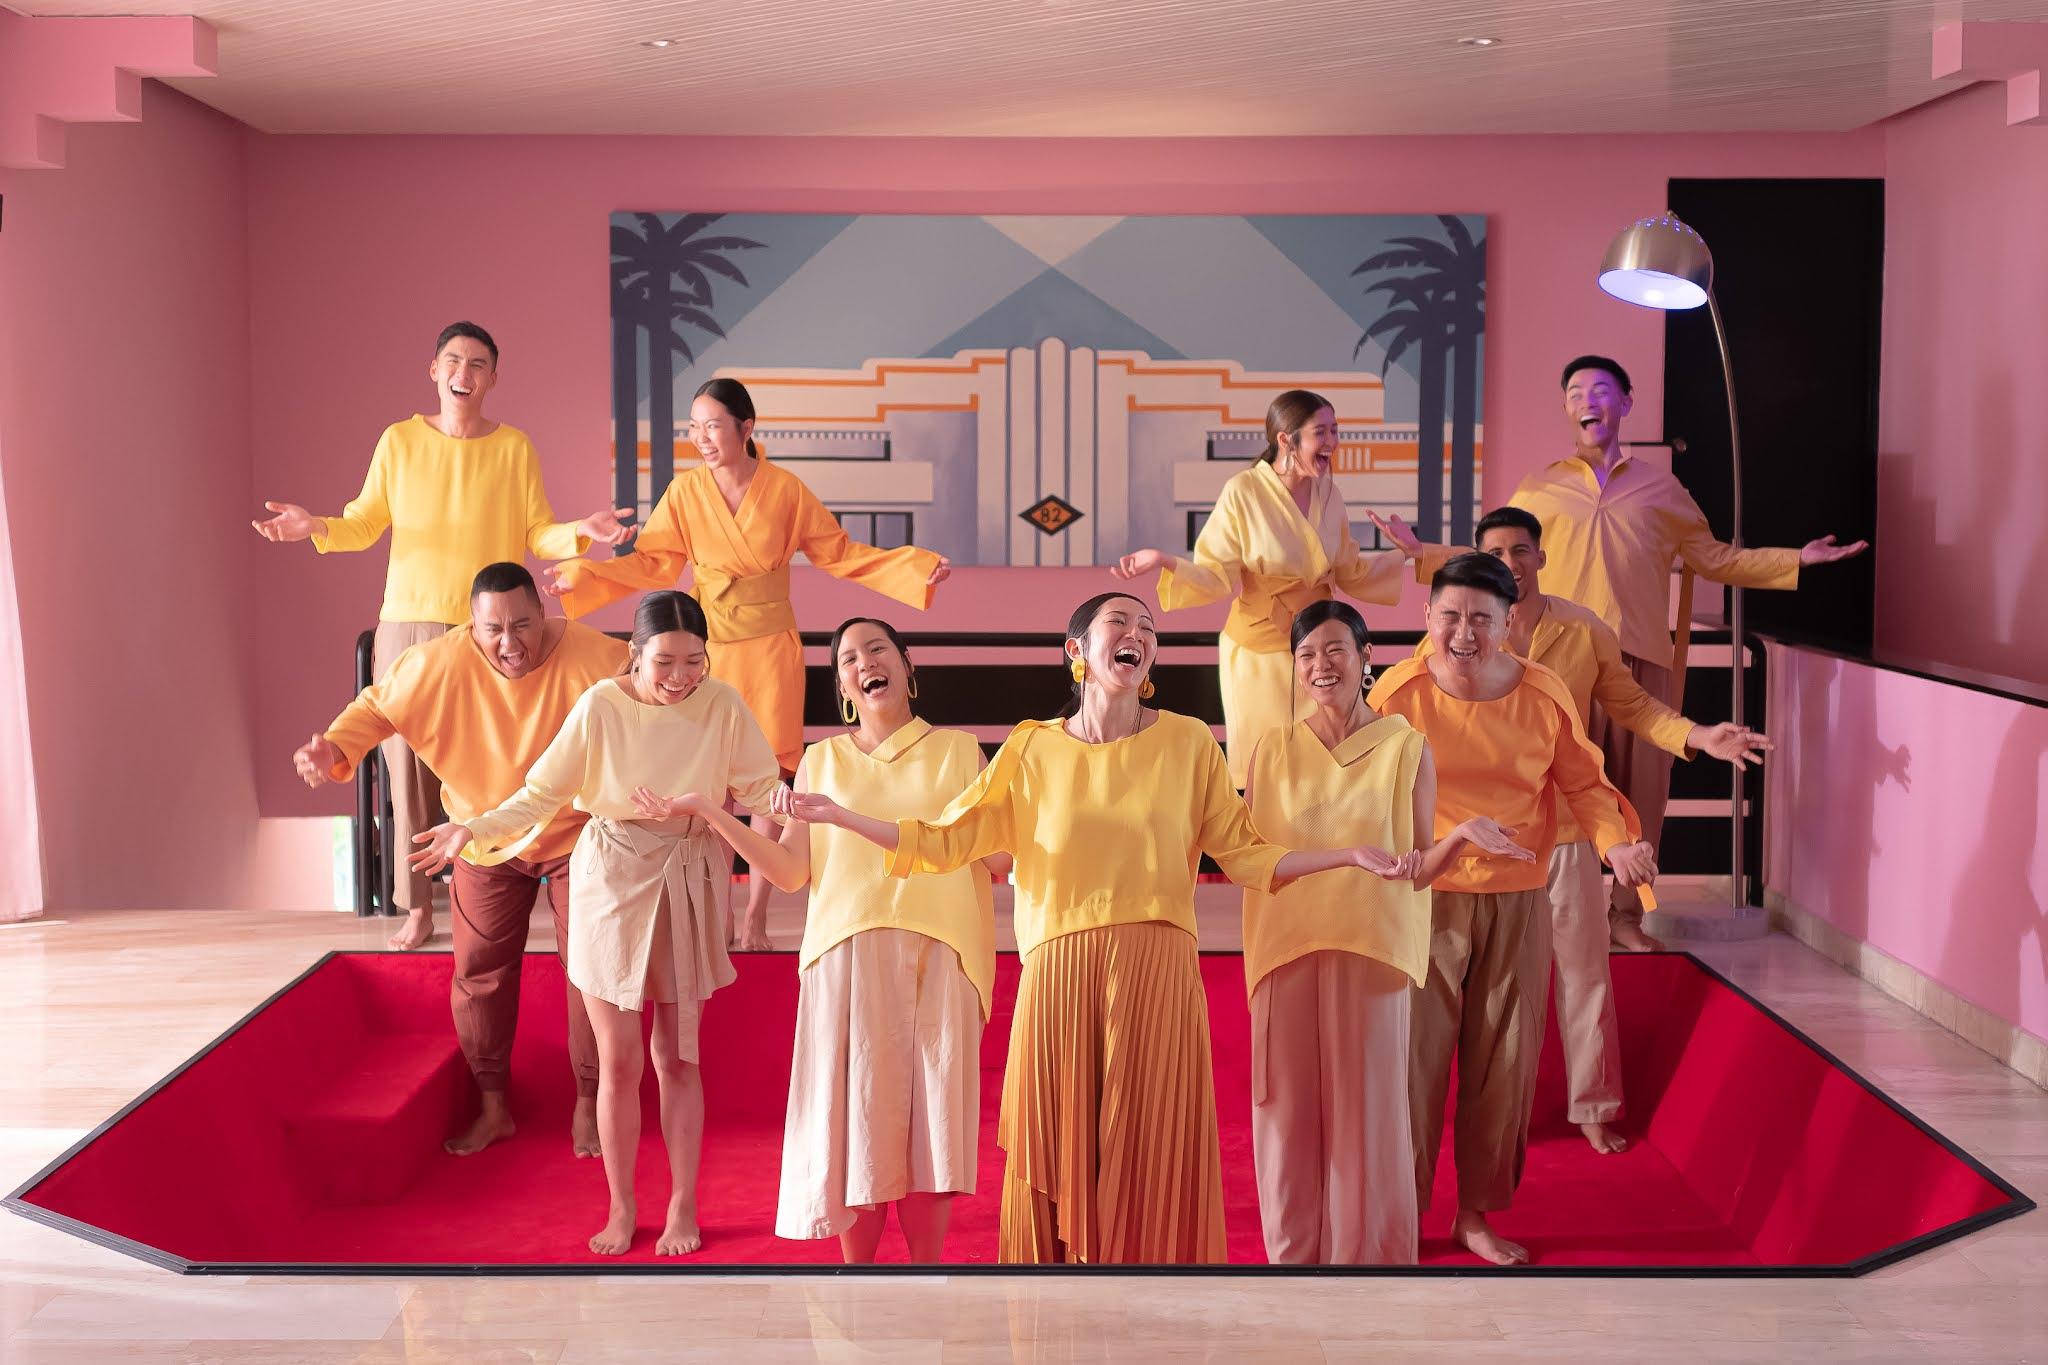 Tiong Bahru Social Club